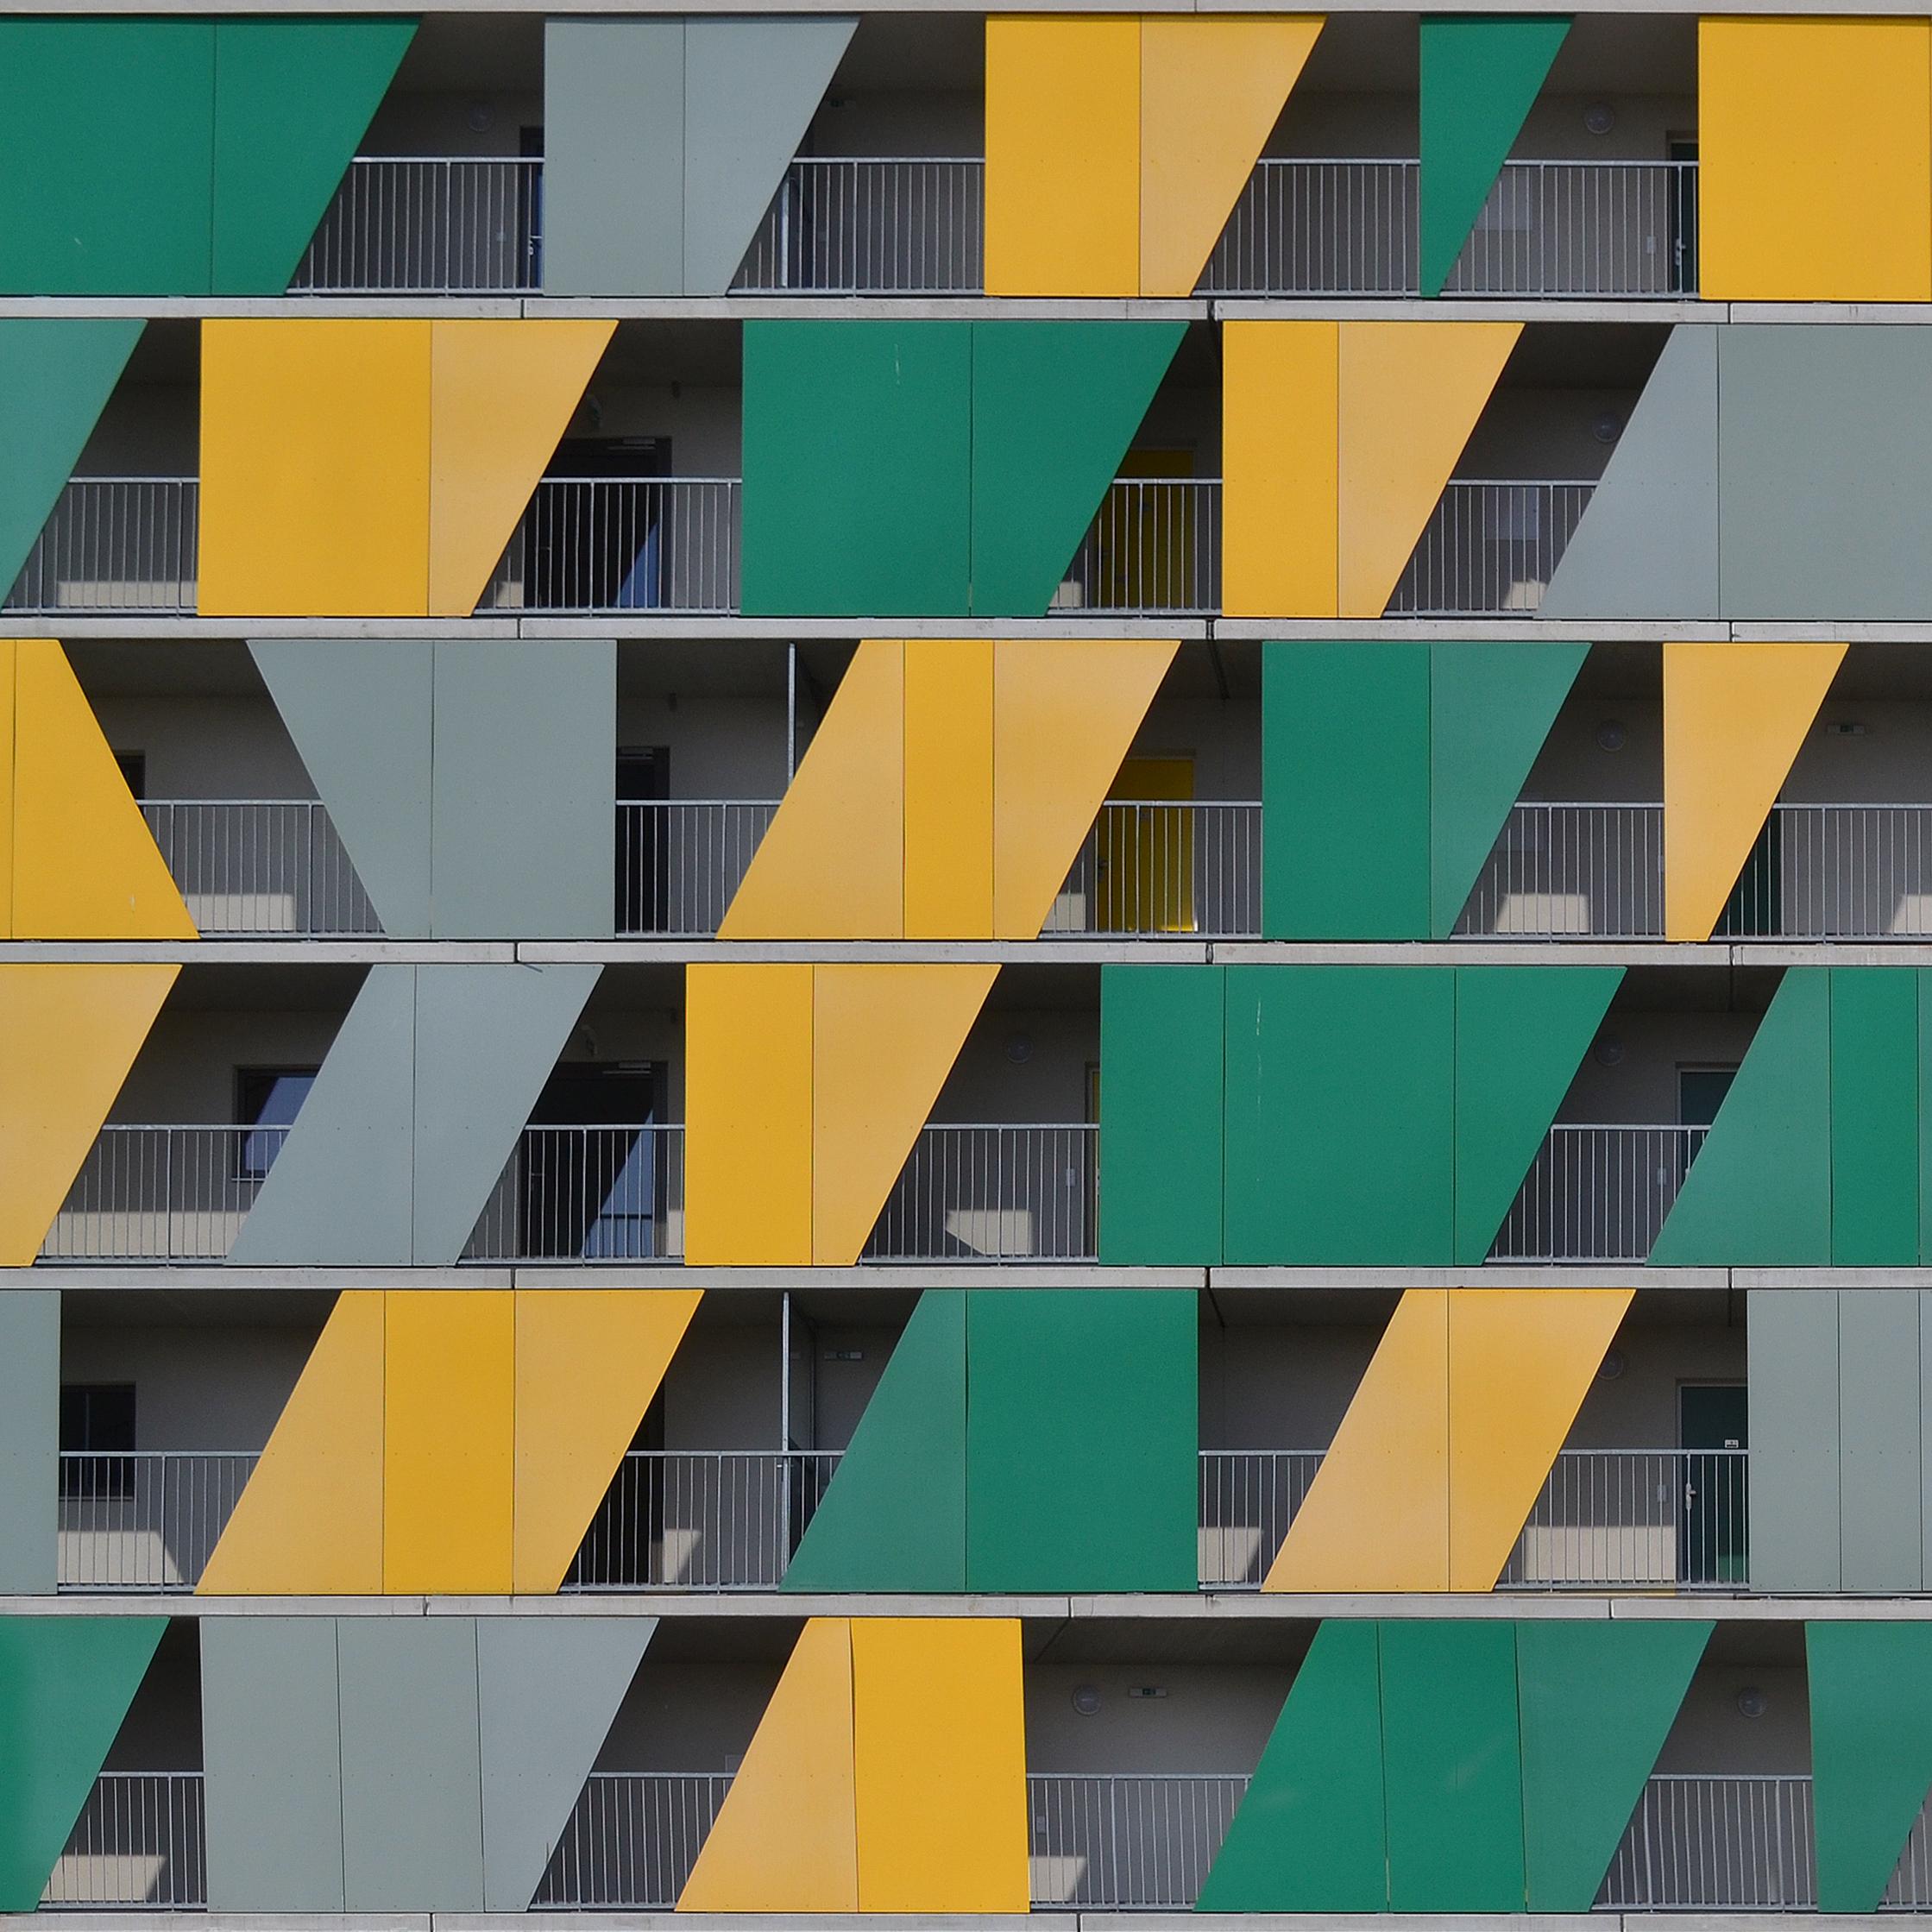 Building Buildings